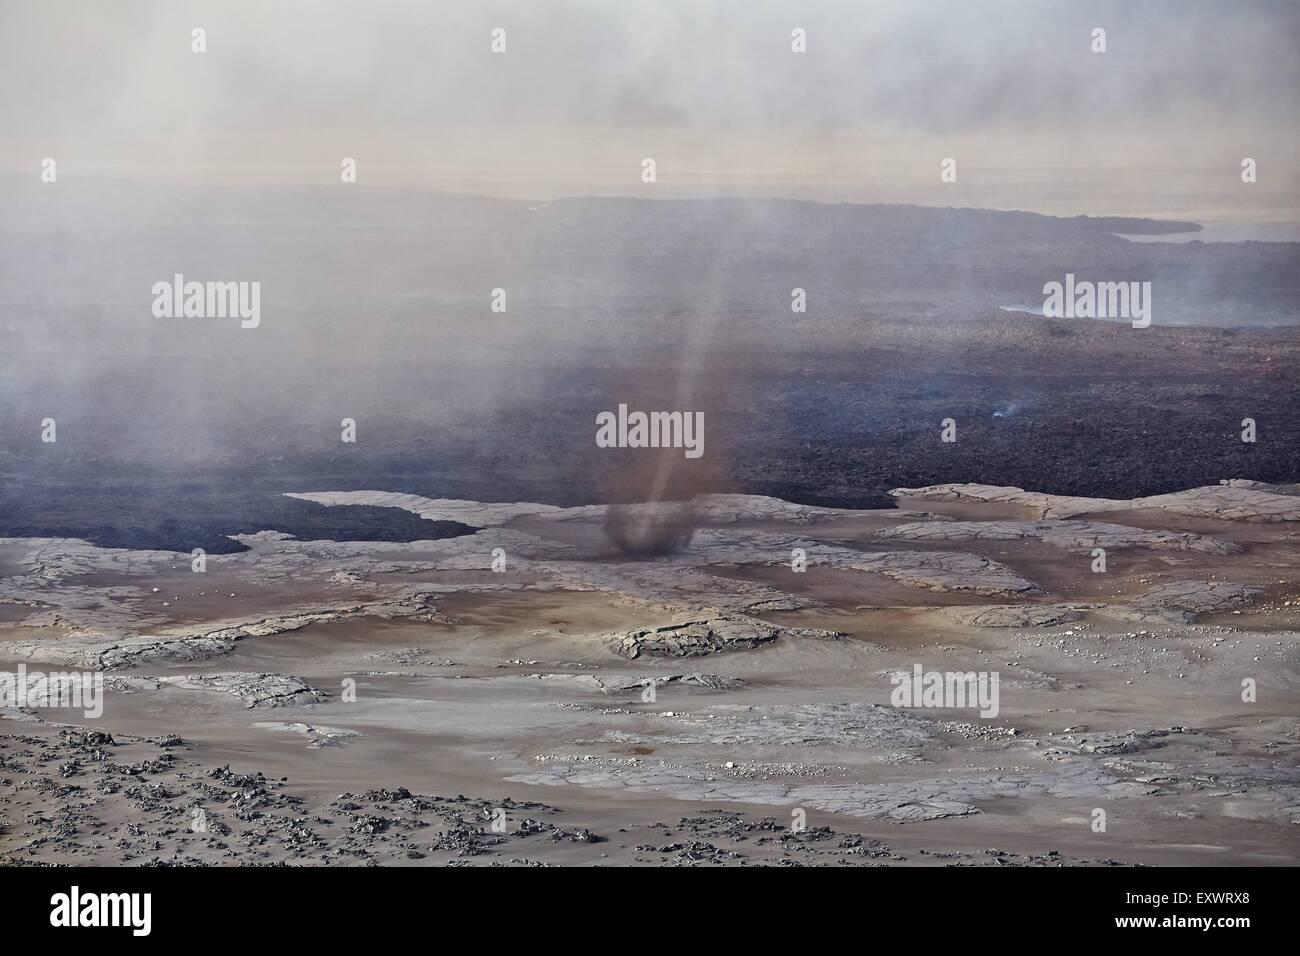 Volcano Bardarbunga, sand storm at lava field Holuhraun at Sept 2nd 2014, Iceland - Stock Image